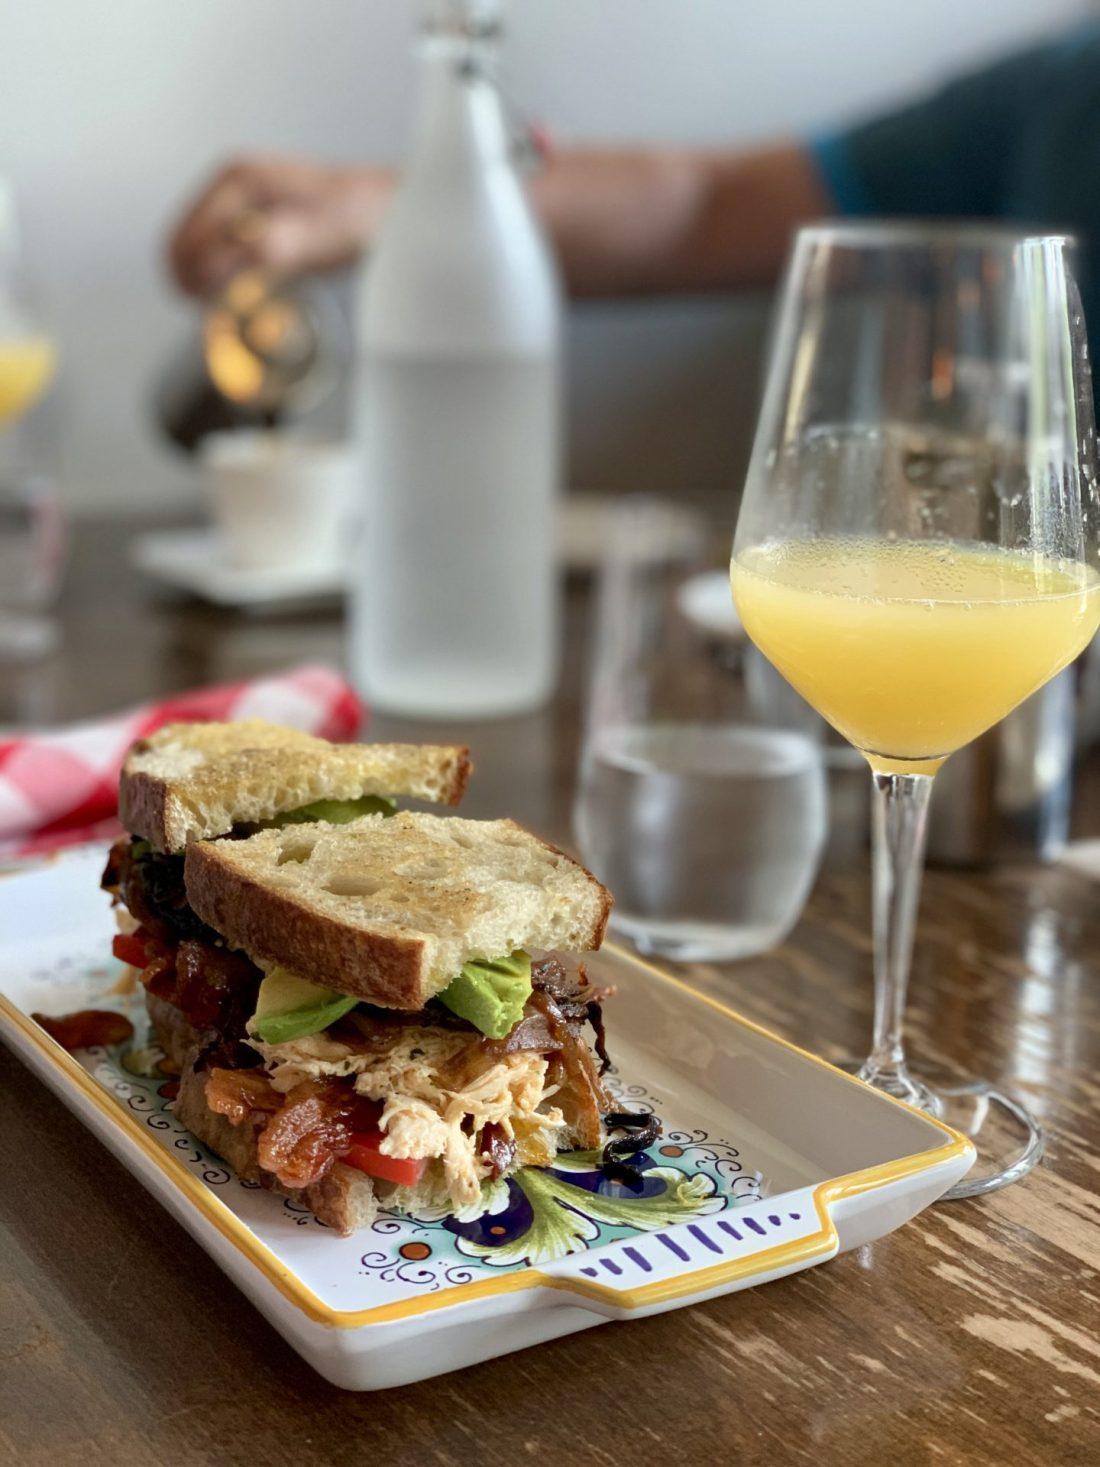 Lolas Sandwich and Mimosa